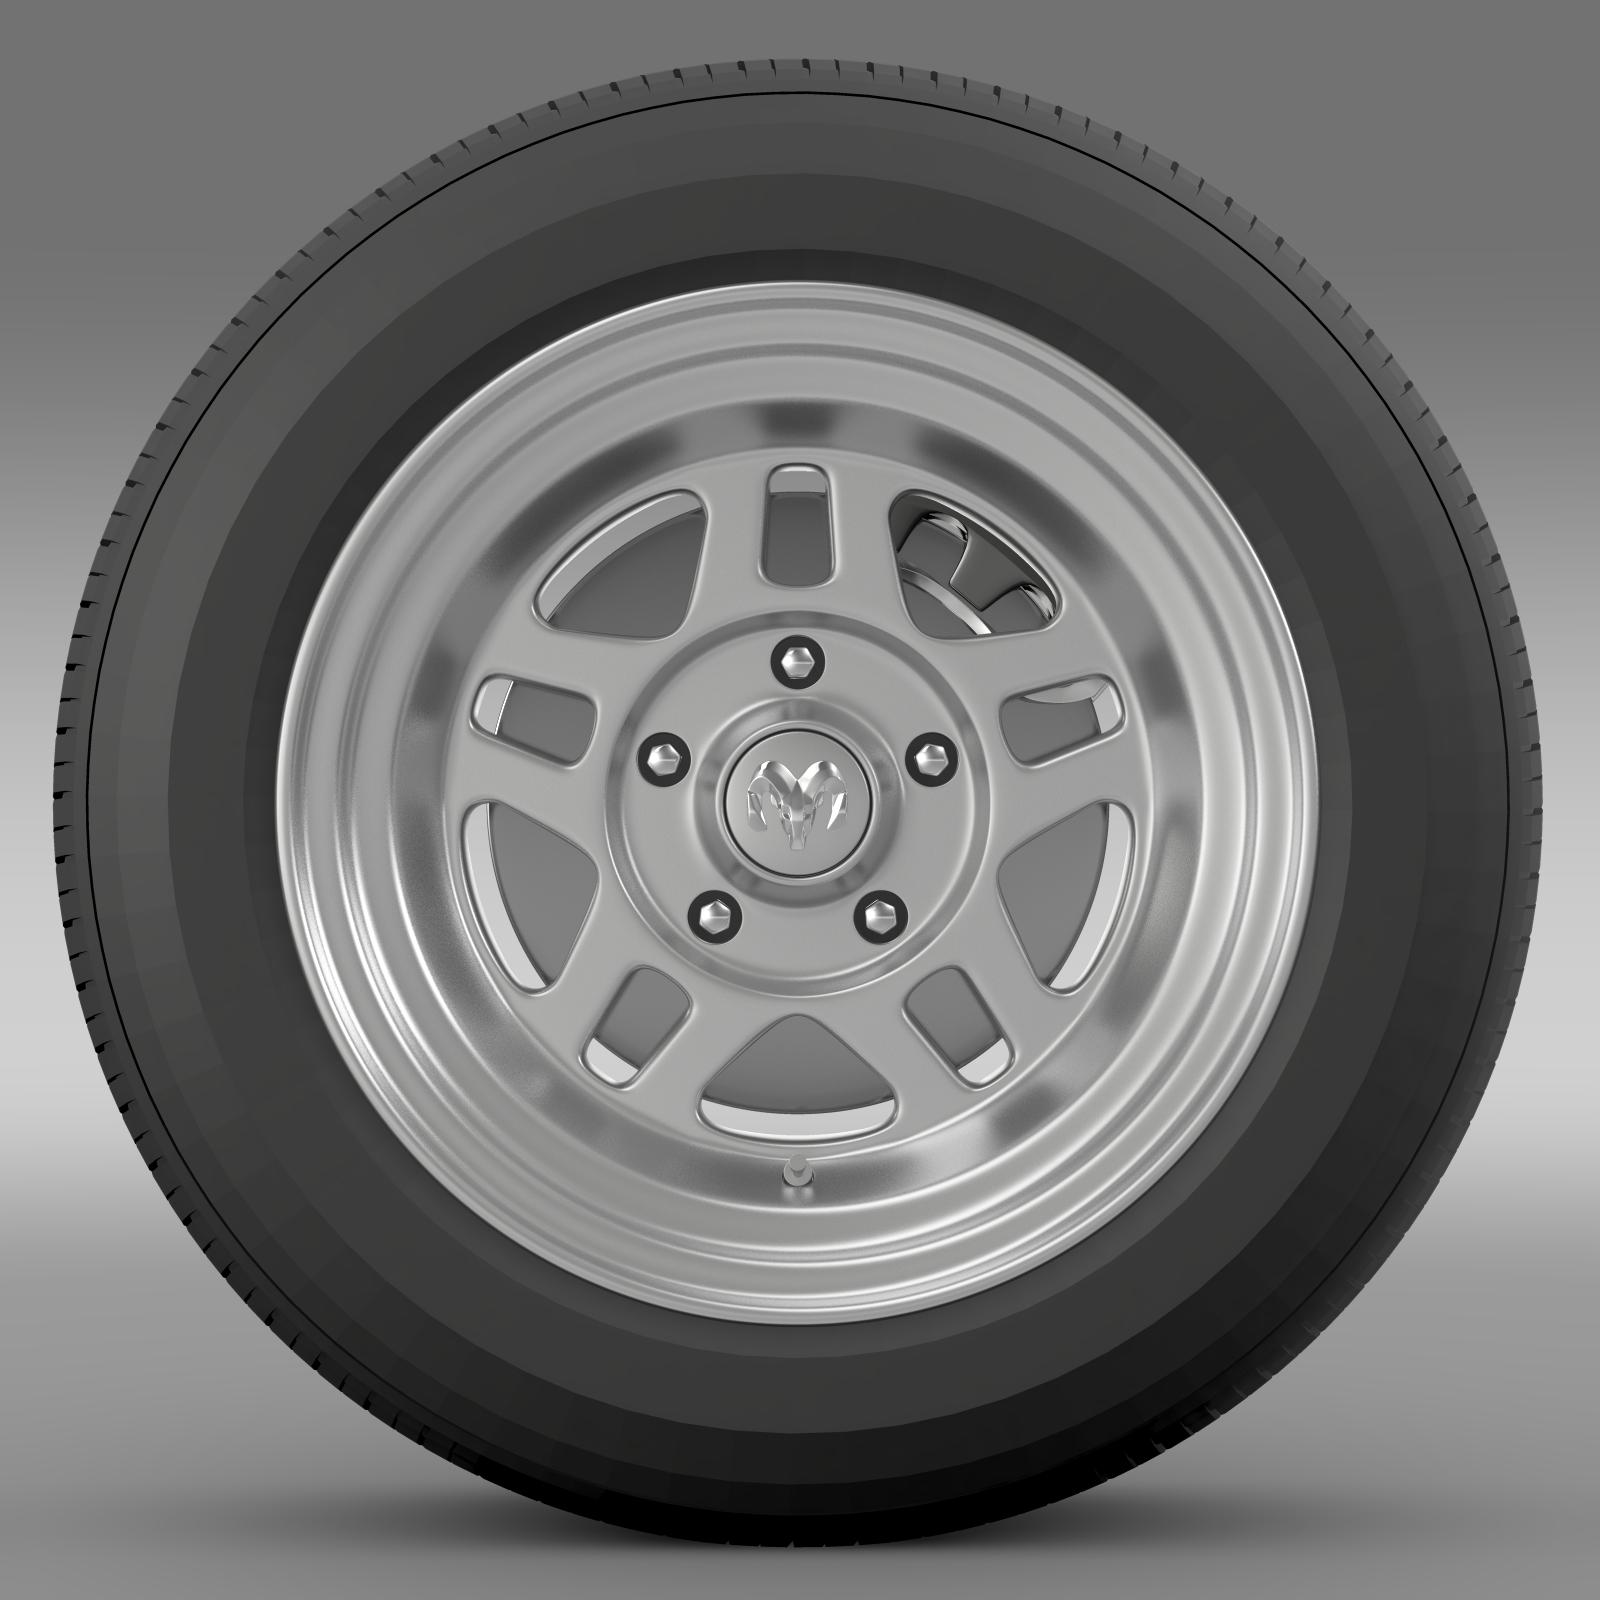 dodge challenger mopar wheel 3d model 3ds max fbx c4d lwo ma mb hrc xsi obj 212808